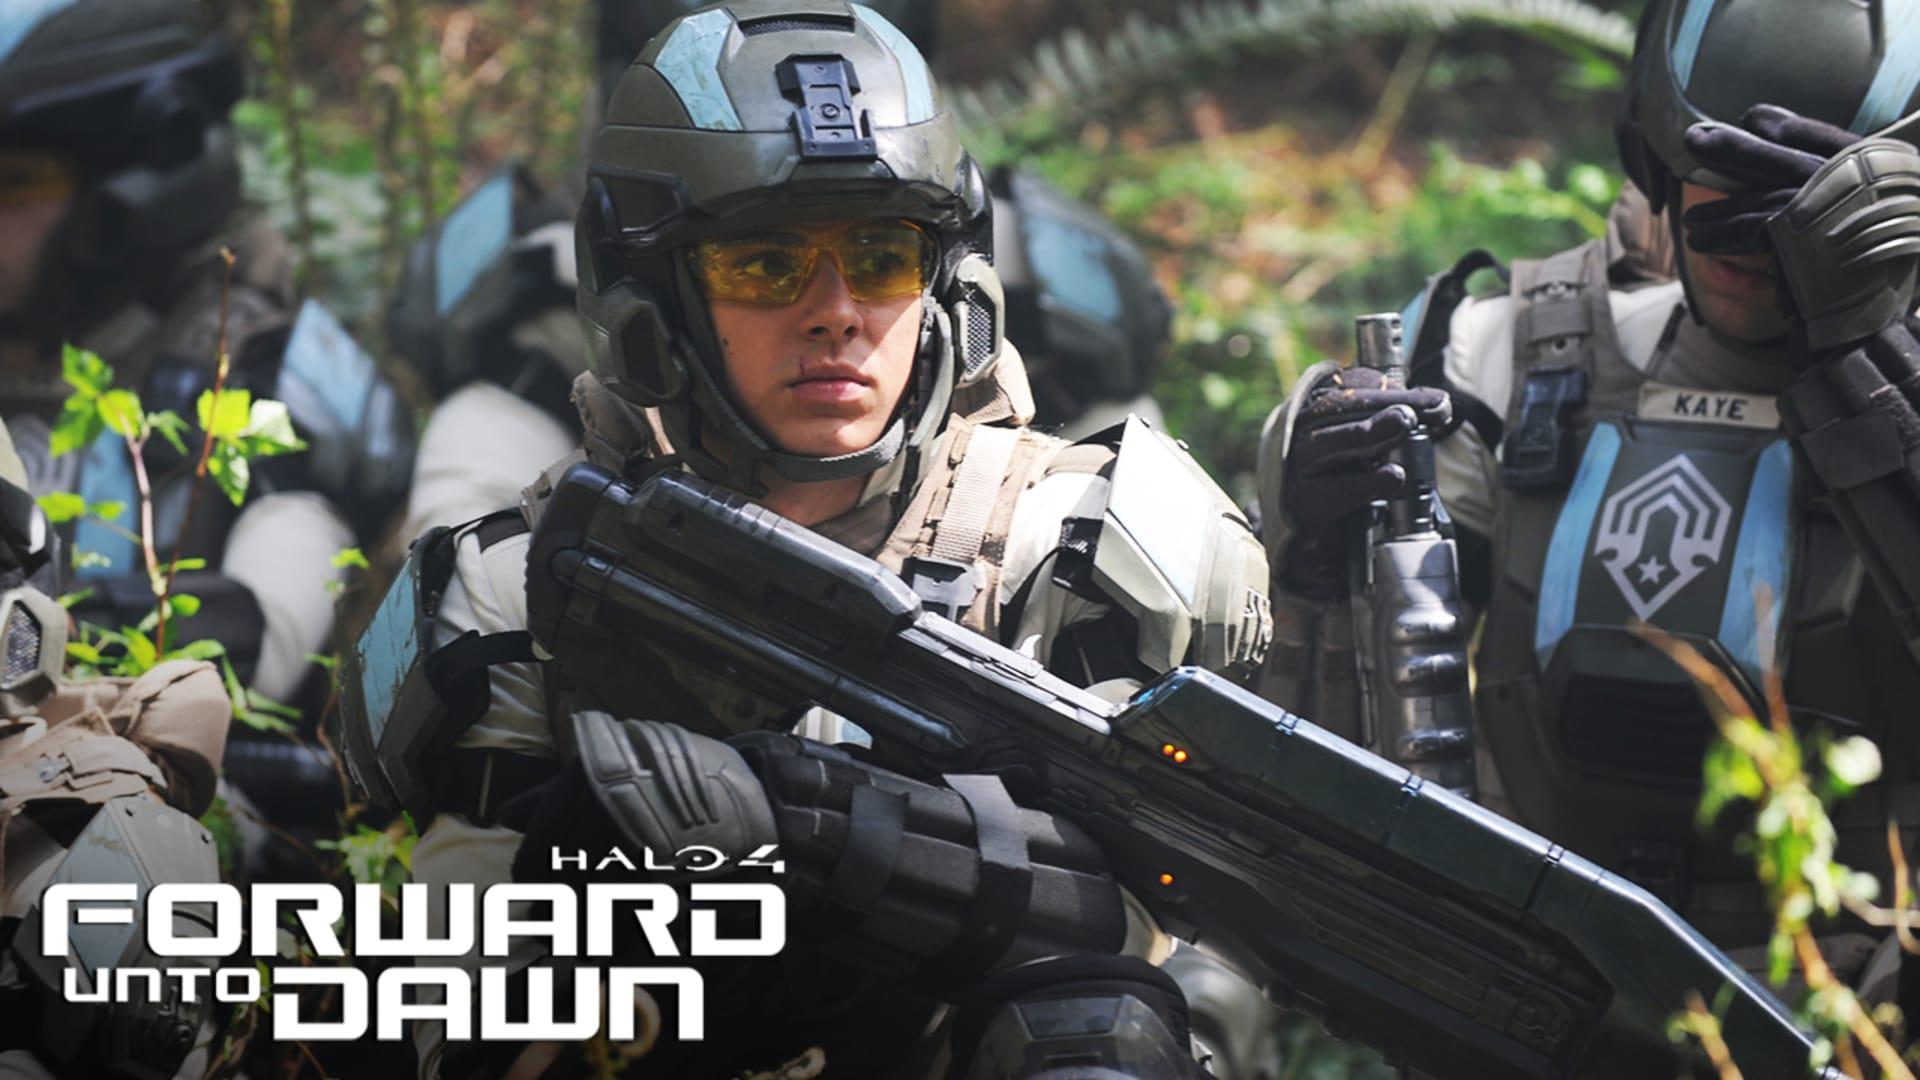 Halo 4 Forward Unto Dawn Halo 4 Forward Unto Dawn Roosterteeth